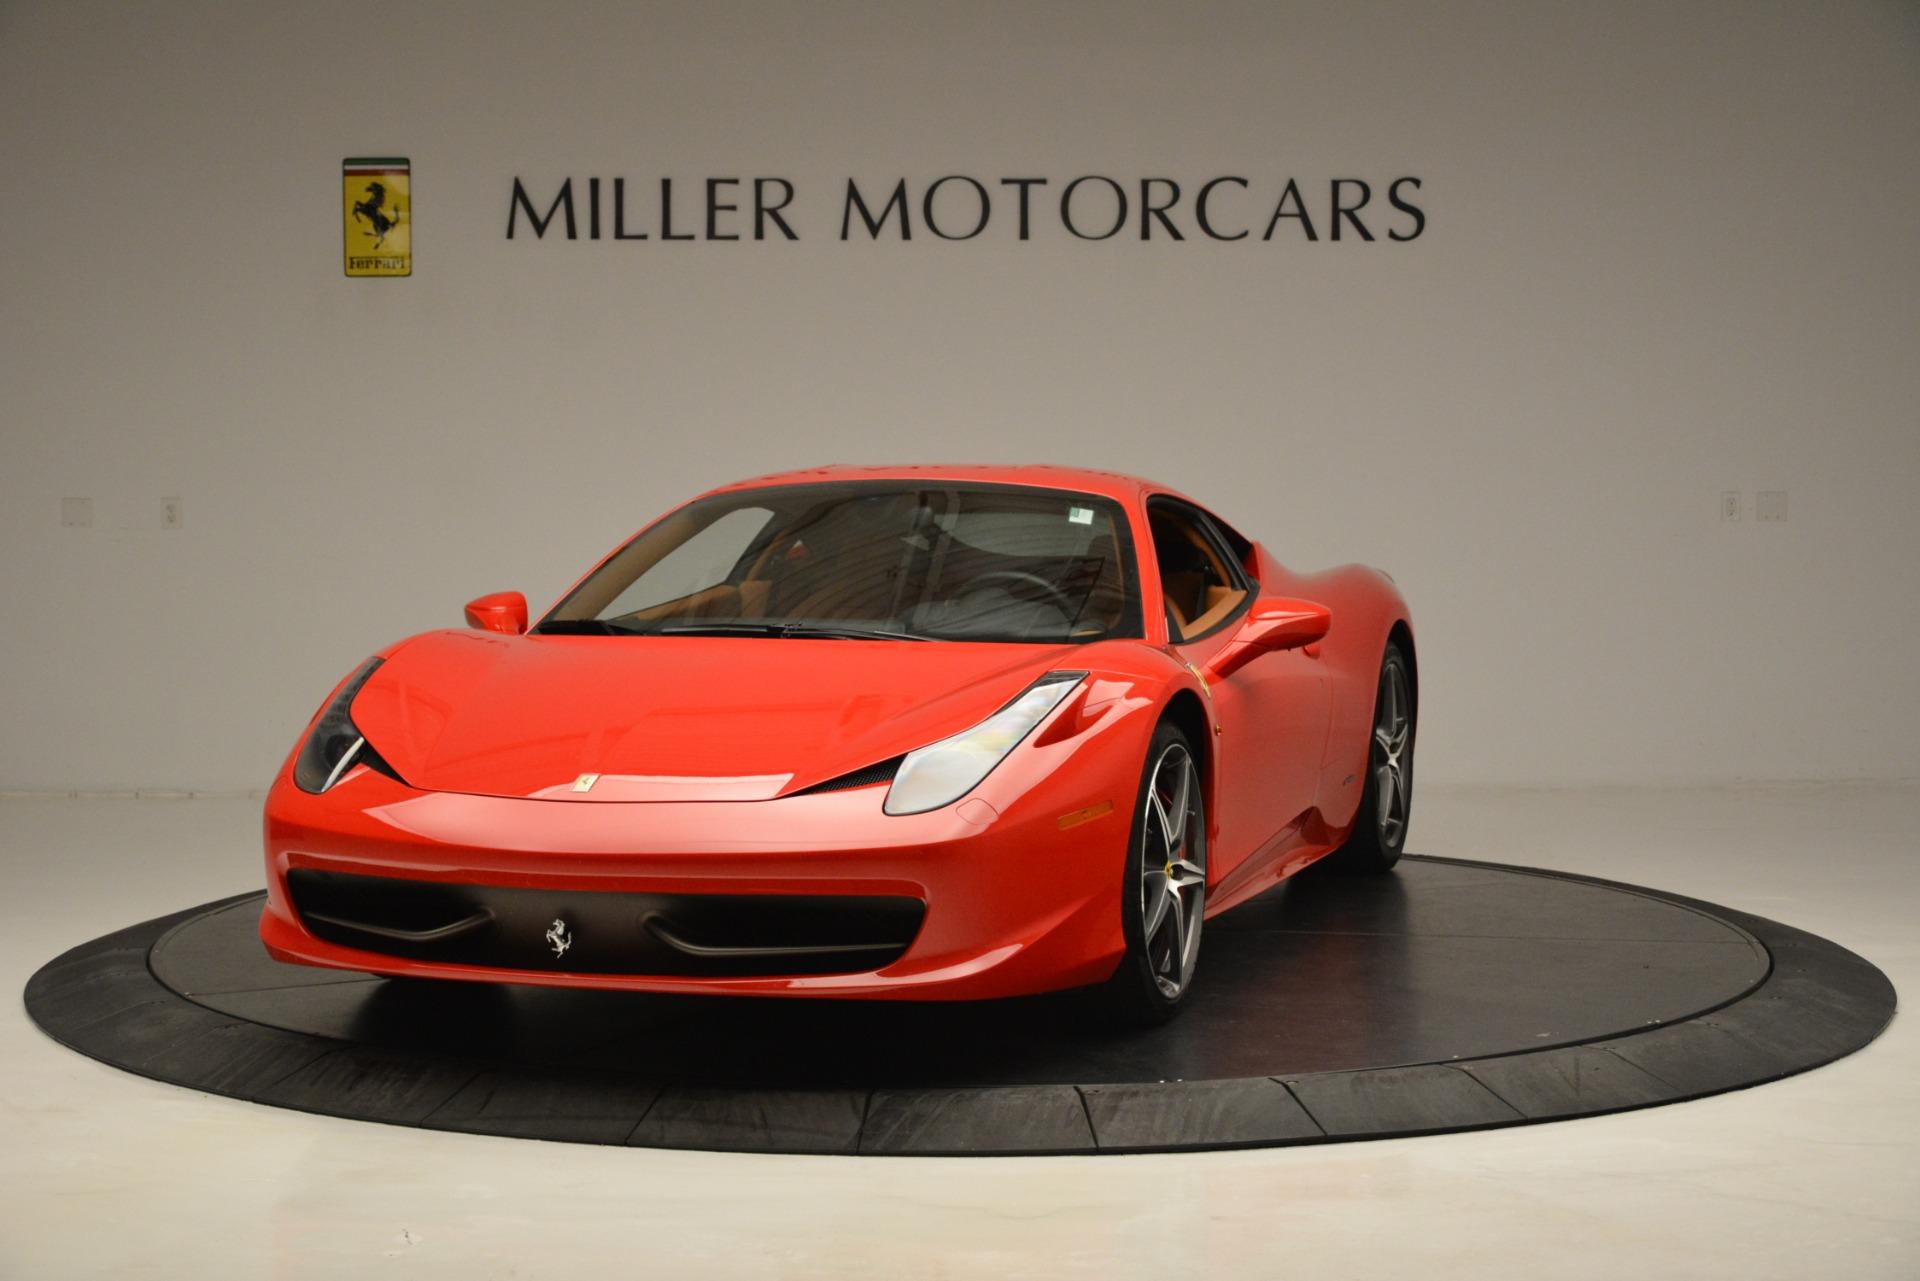 Used 2014 Ferrari 458 Italia for sale Sold at Pagani of Greenwich in Greenwich CT 06830 1